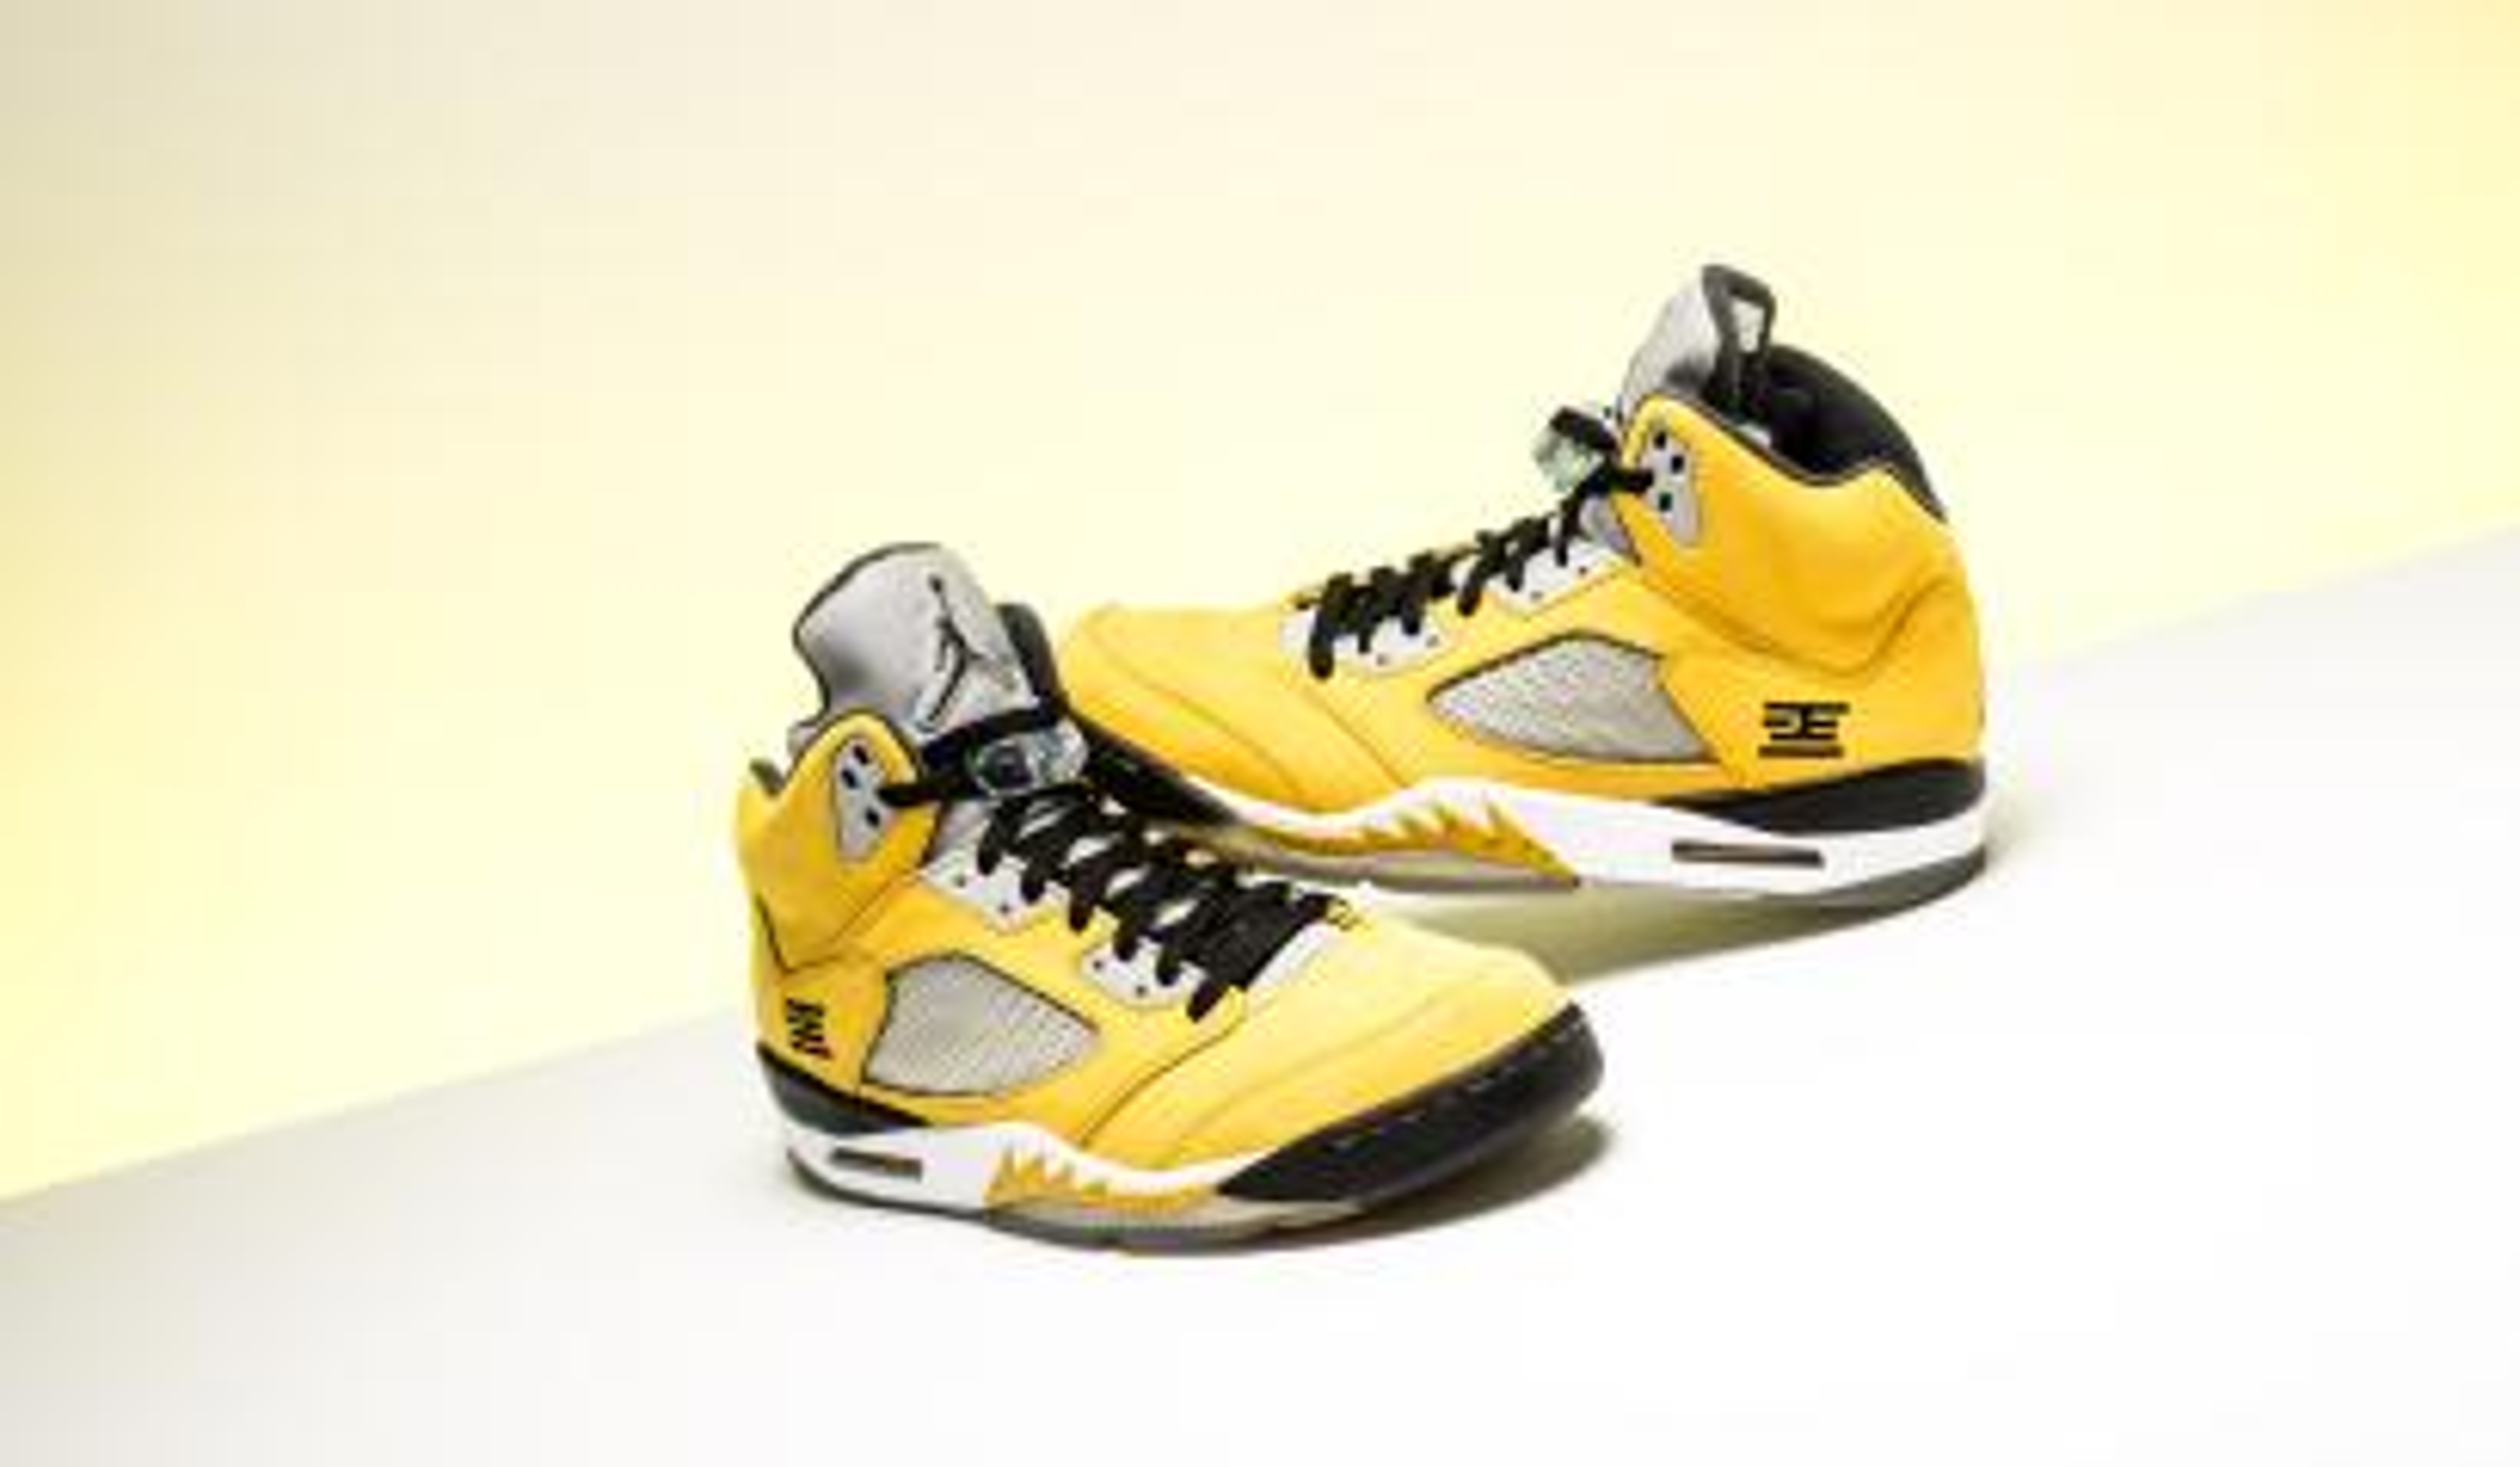 A pair of yellow Nike Air Jordan 5s